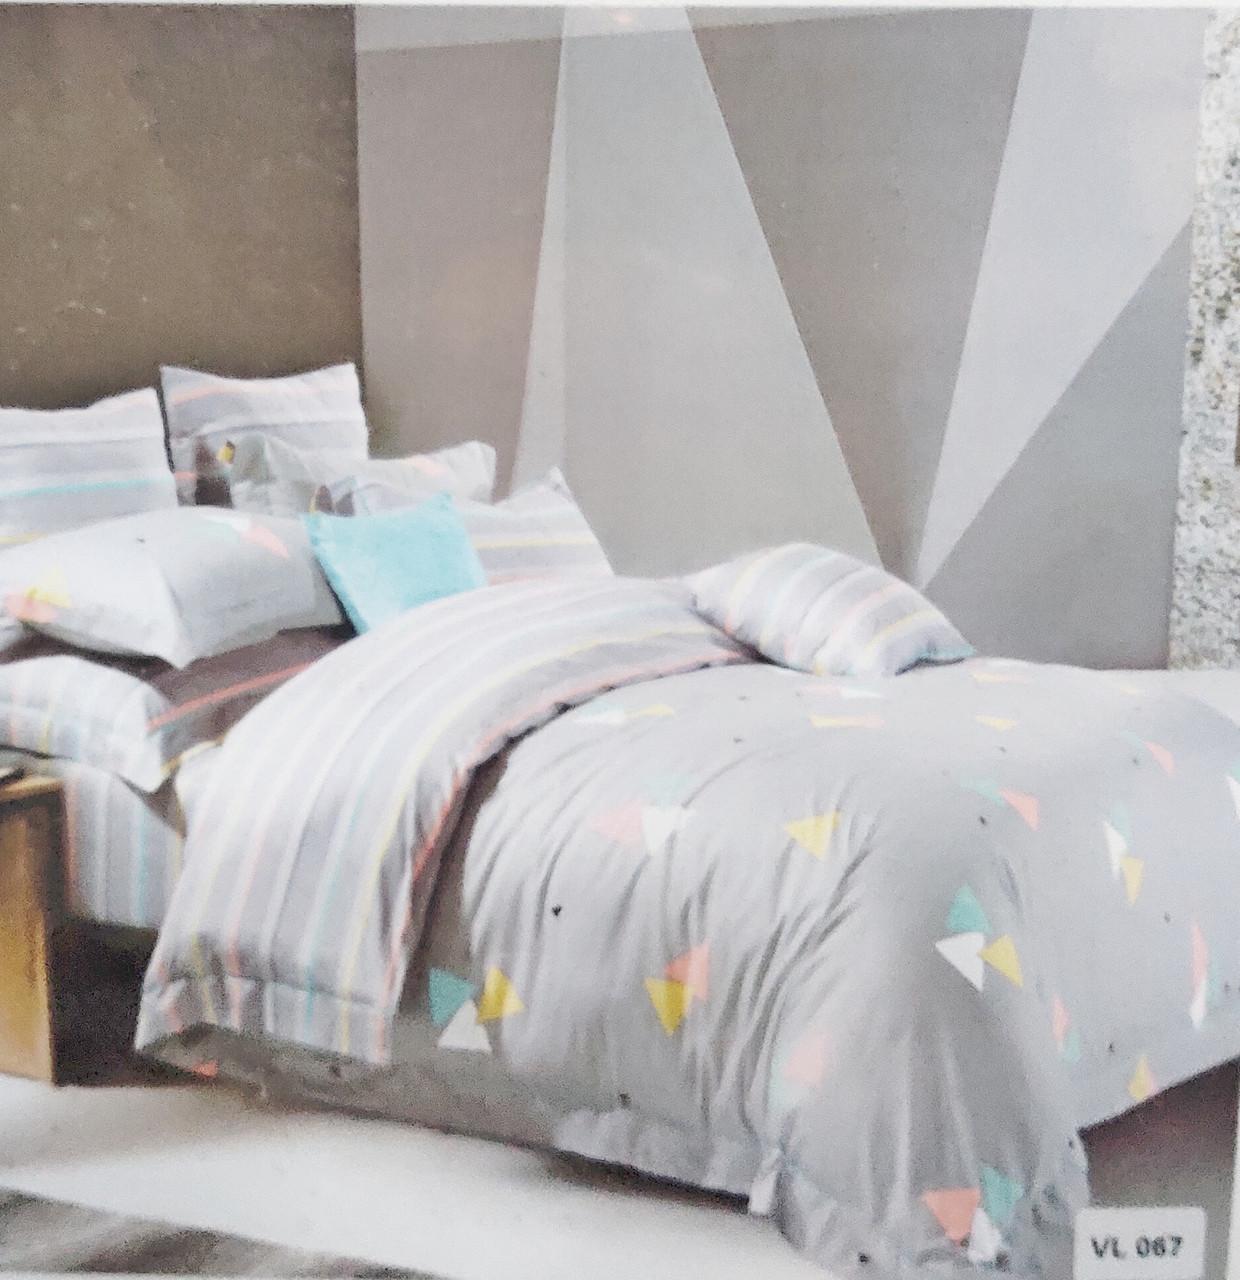 Комплект постельного белья Vie Nouvelle Velour 200х220 VL 067 Евро